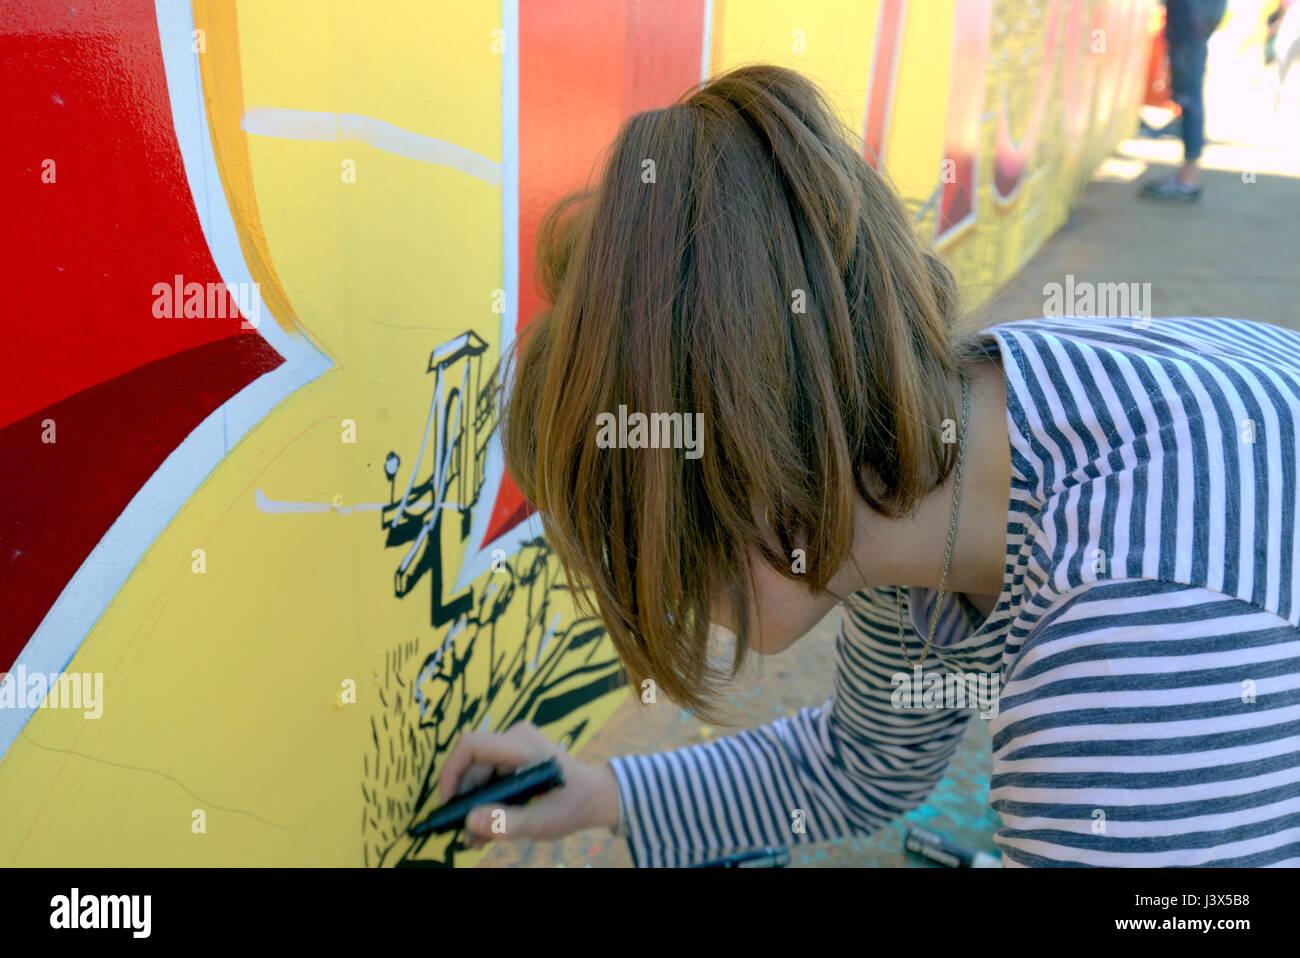 Glasgow, Scotland, UK. 7th May, 2017. 'Yard Works Festival 2017' is an International celebration of Graffiti, Street - Stock Image